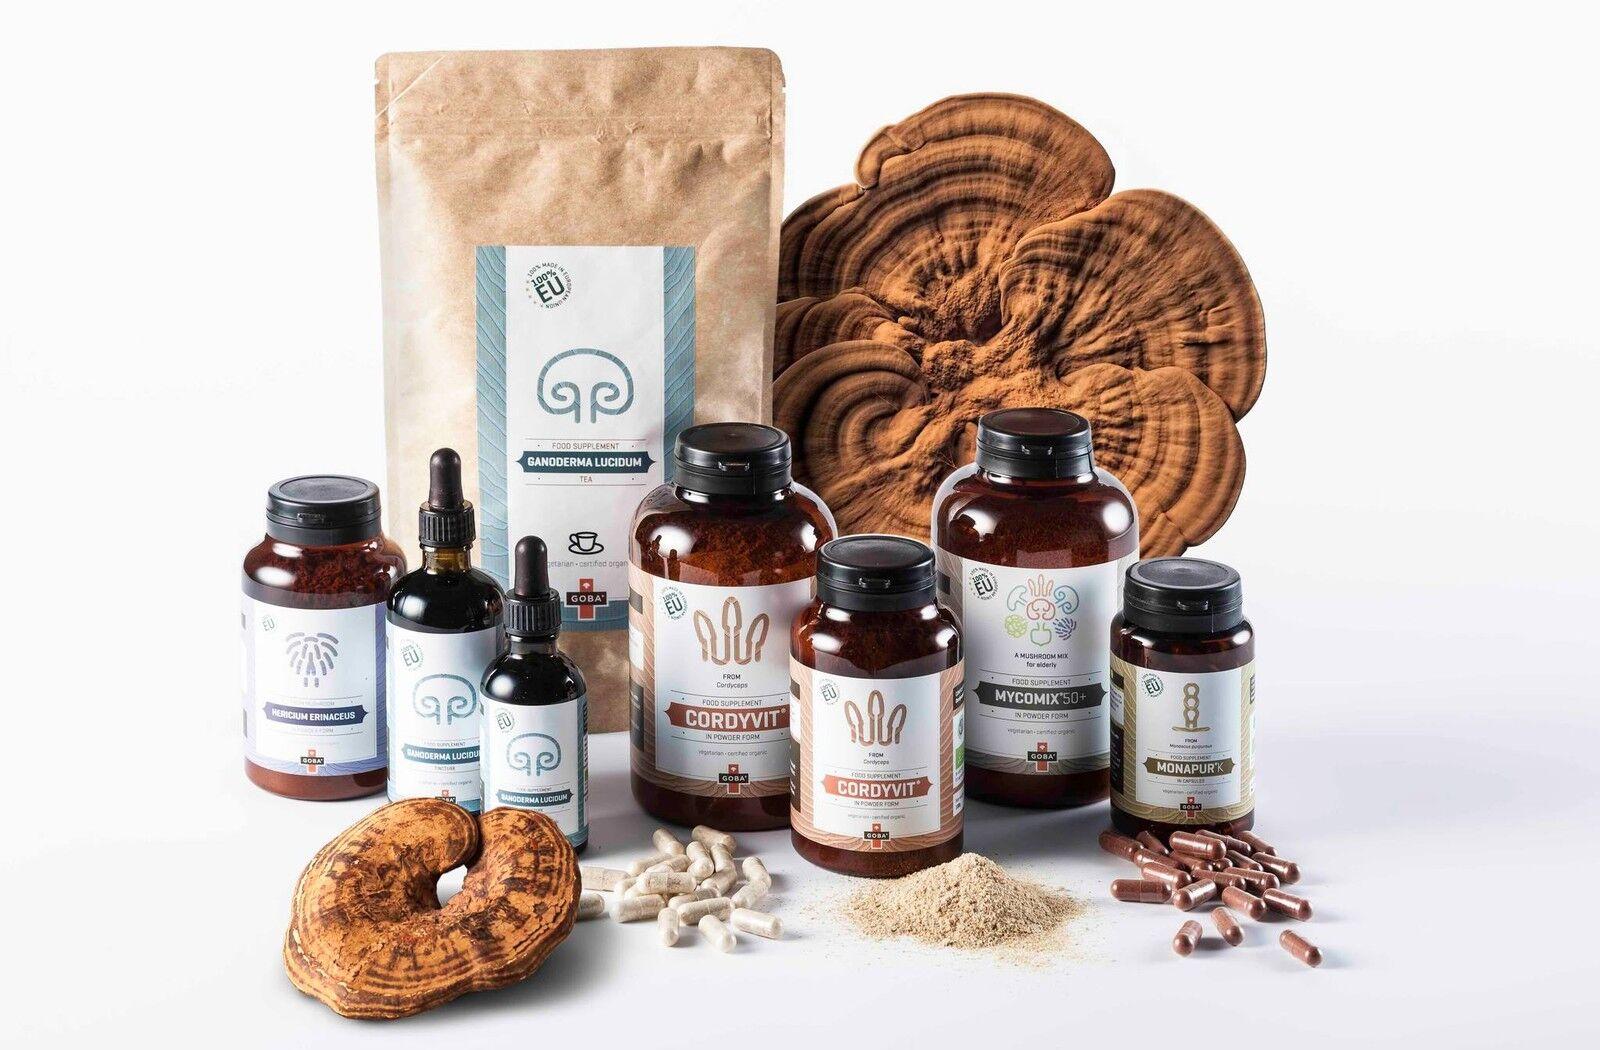 ORGANIC Medicinal Mushrooms